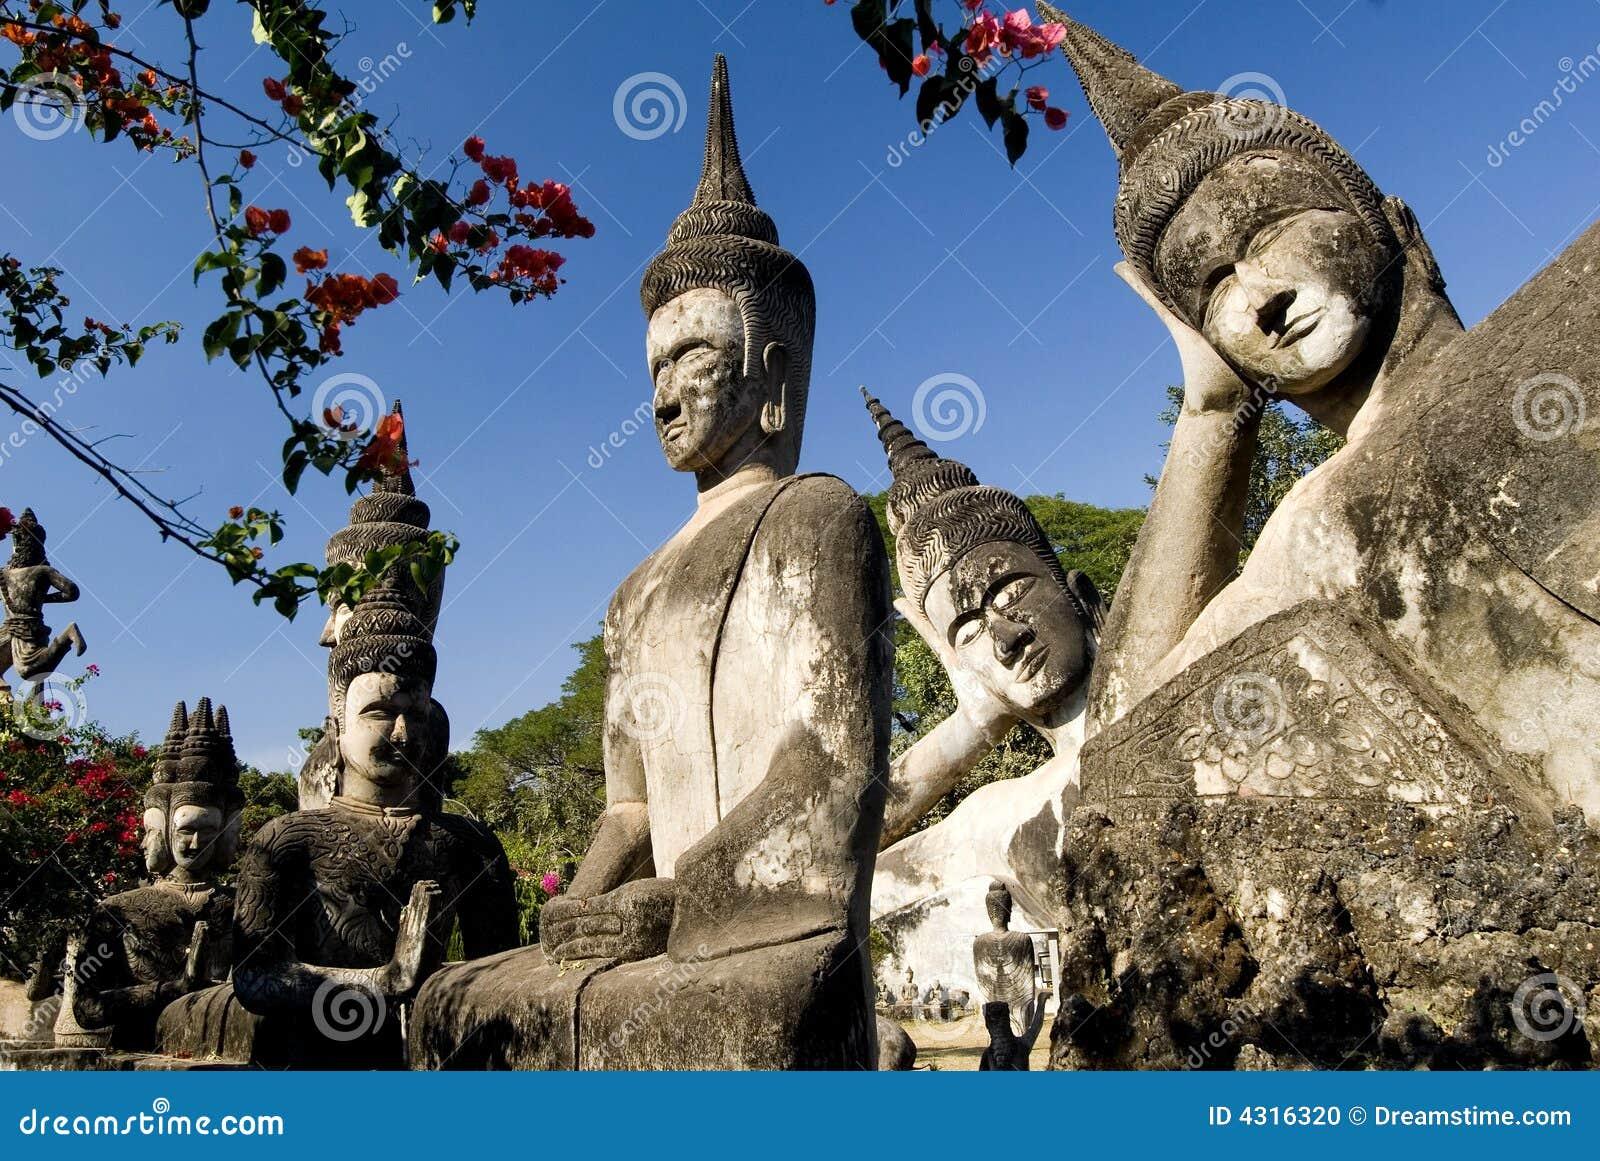 Many Buddhas - Vientiane. Laos